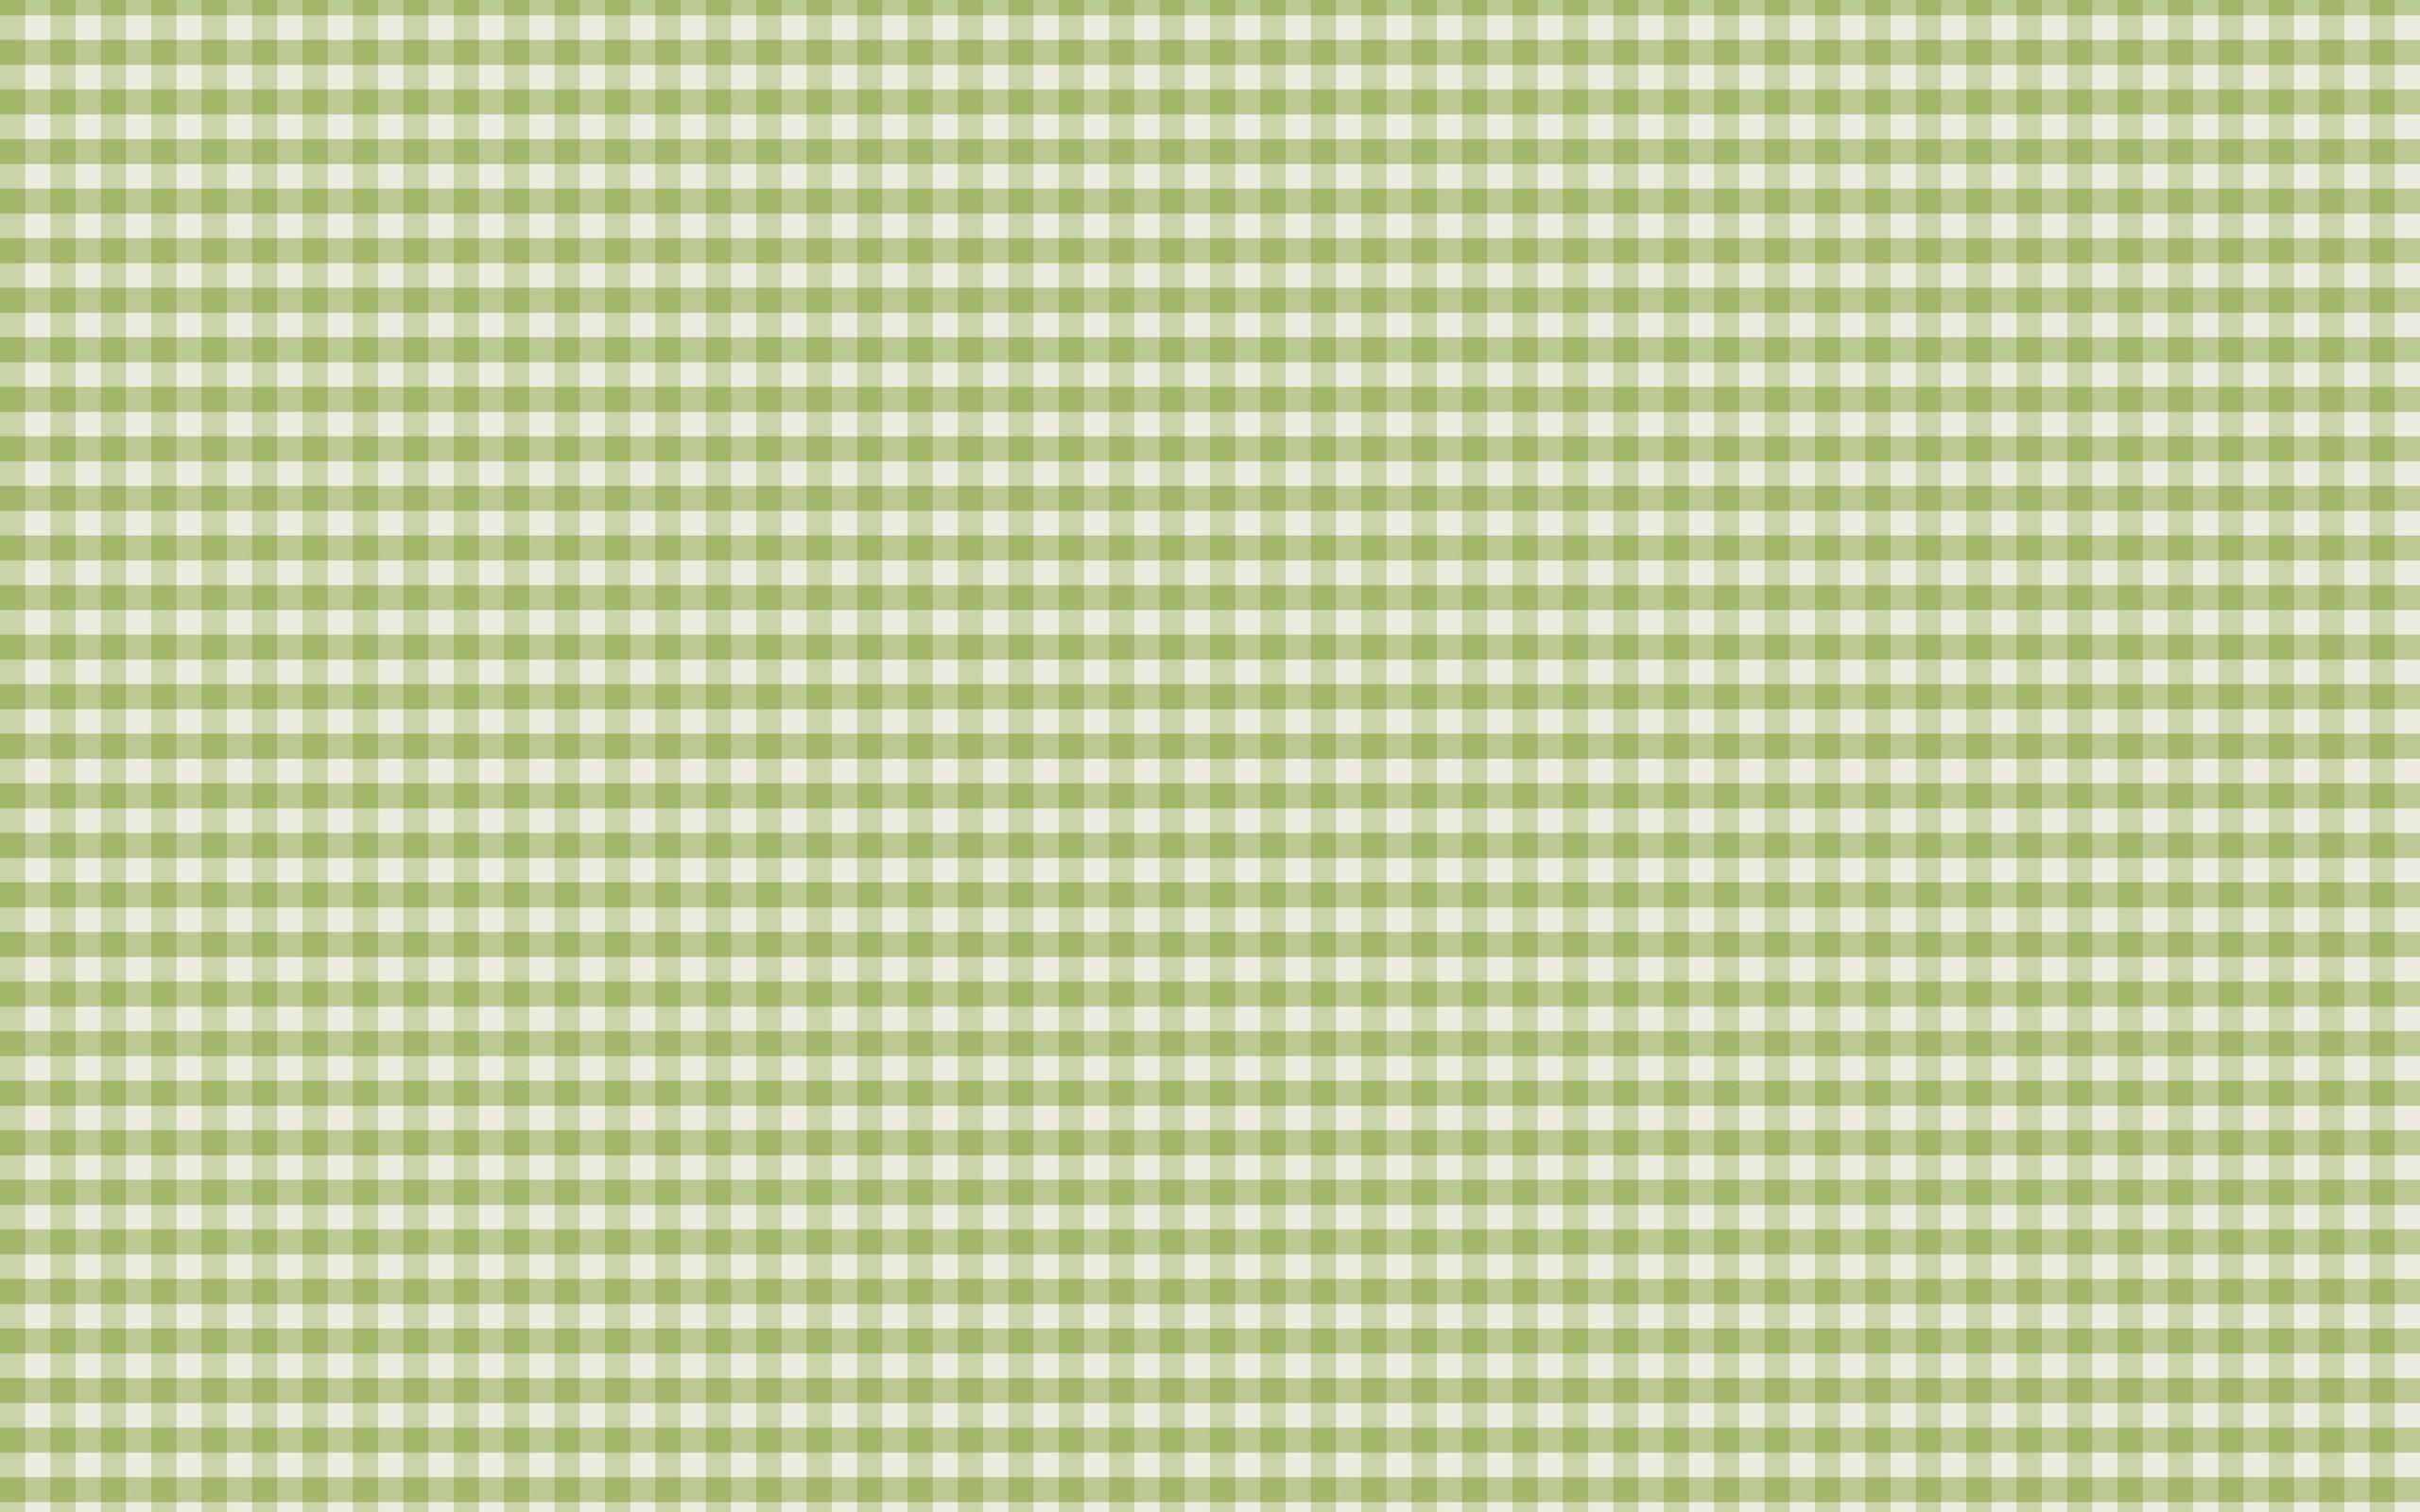 Green Plaid Wallpaper